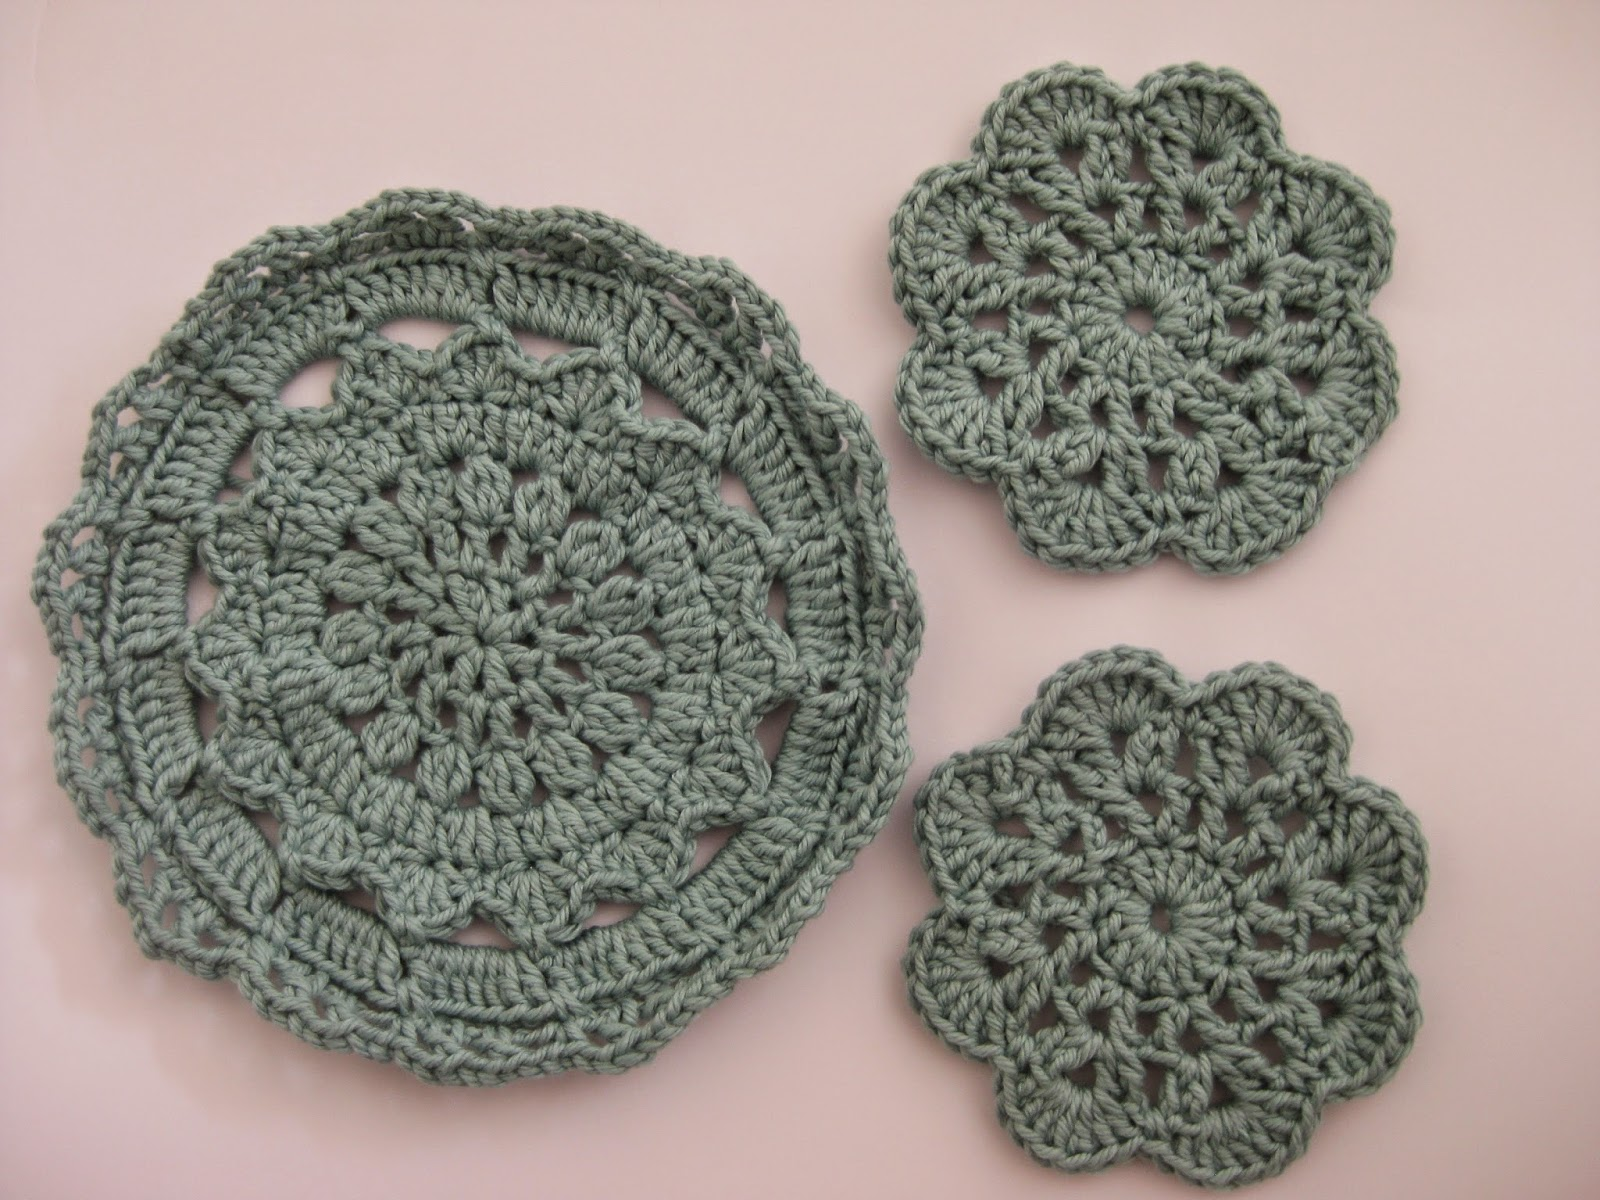 CraftyRie: Taa daa: some pretty coasters